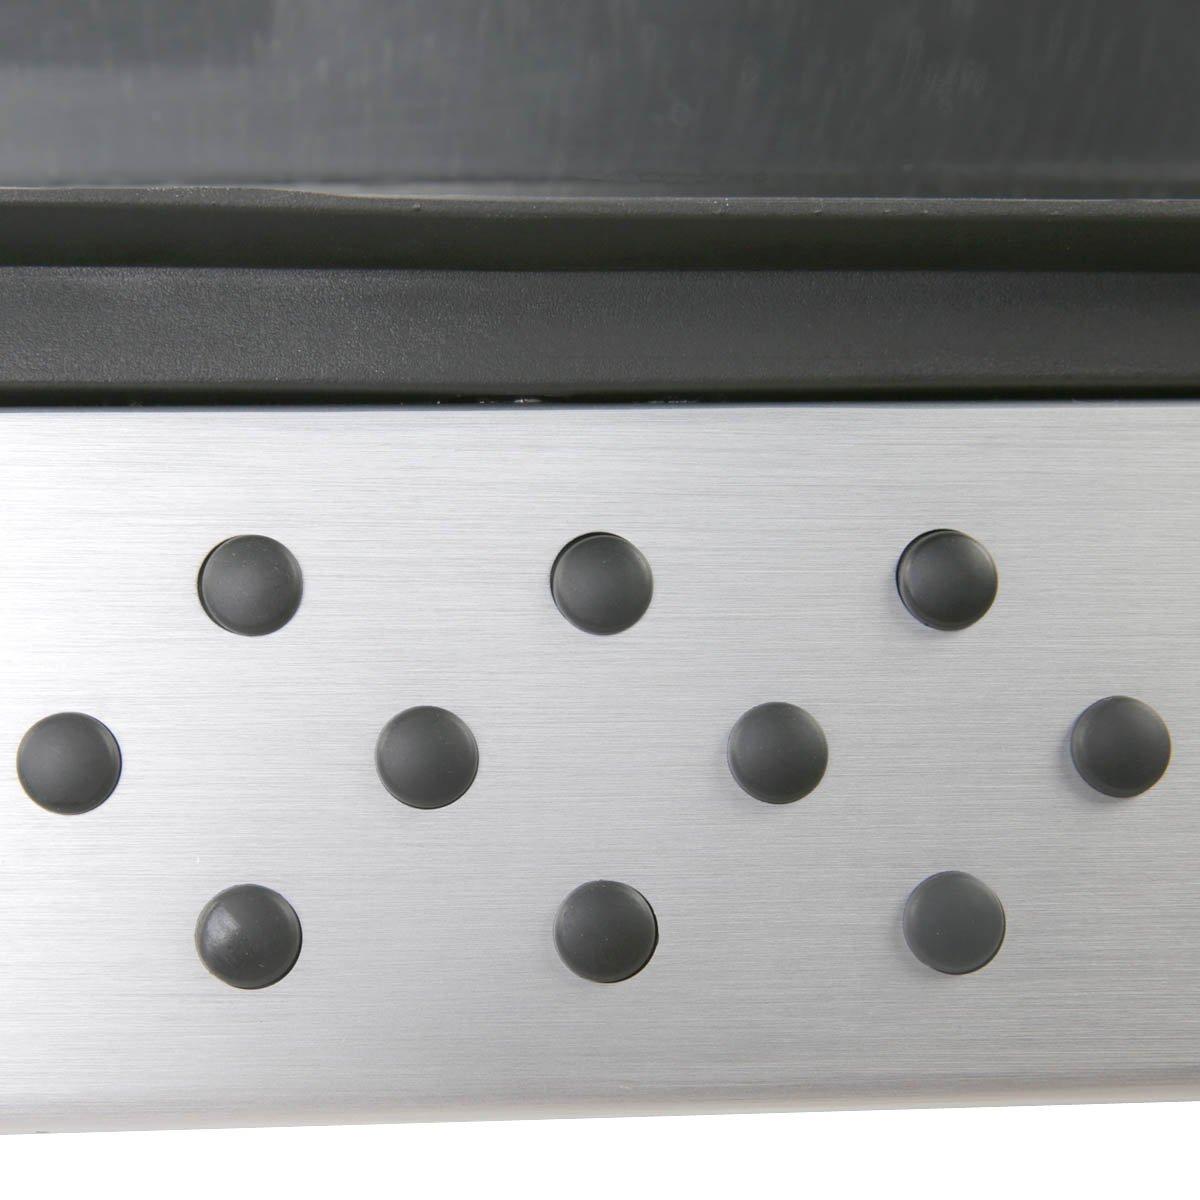 Aluminium Trittbretter Schwellen Bretter Schwellerrohre X5 E70 Bj 2006-2013